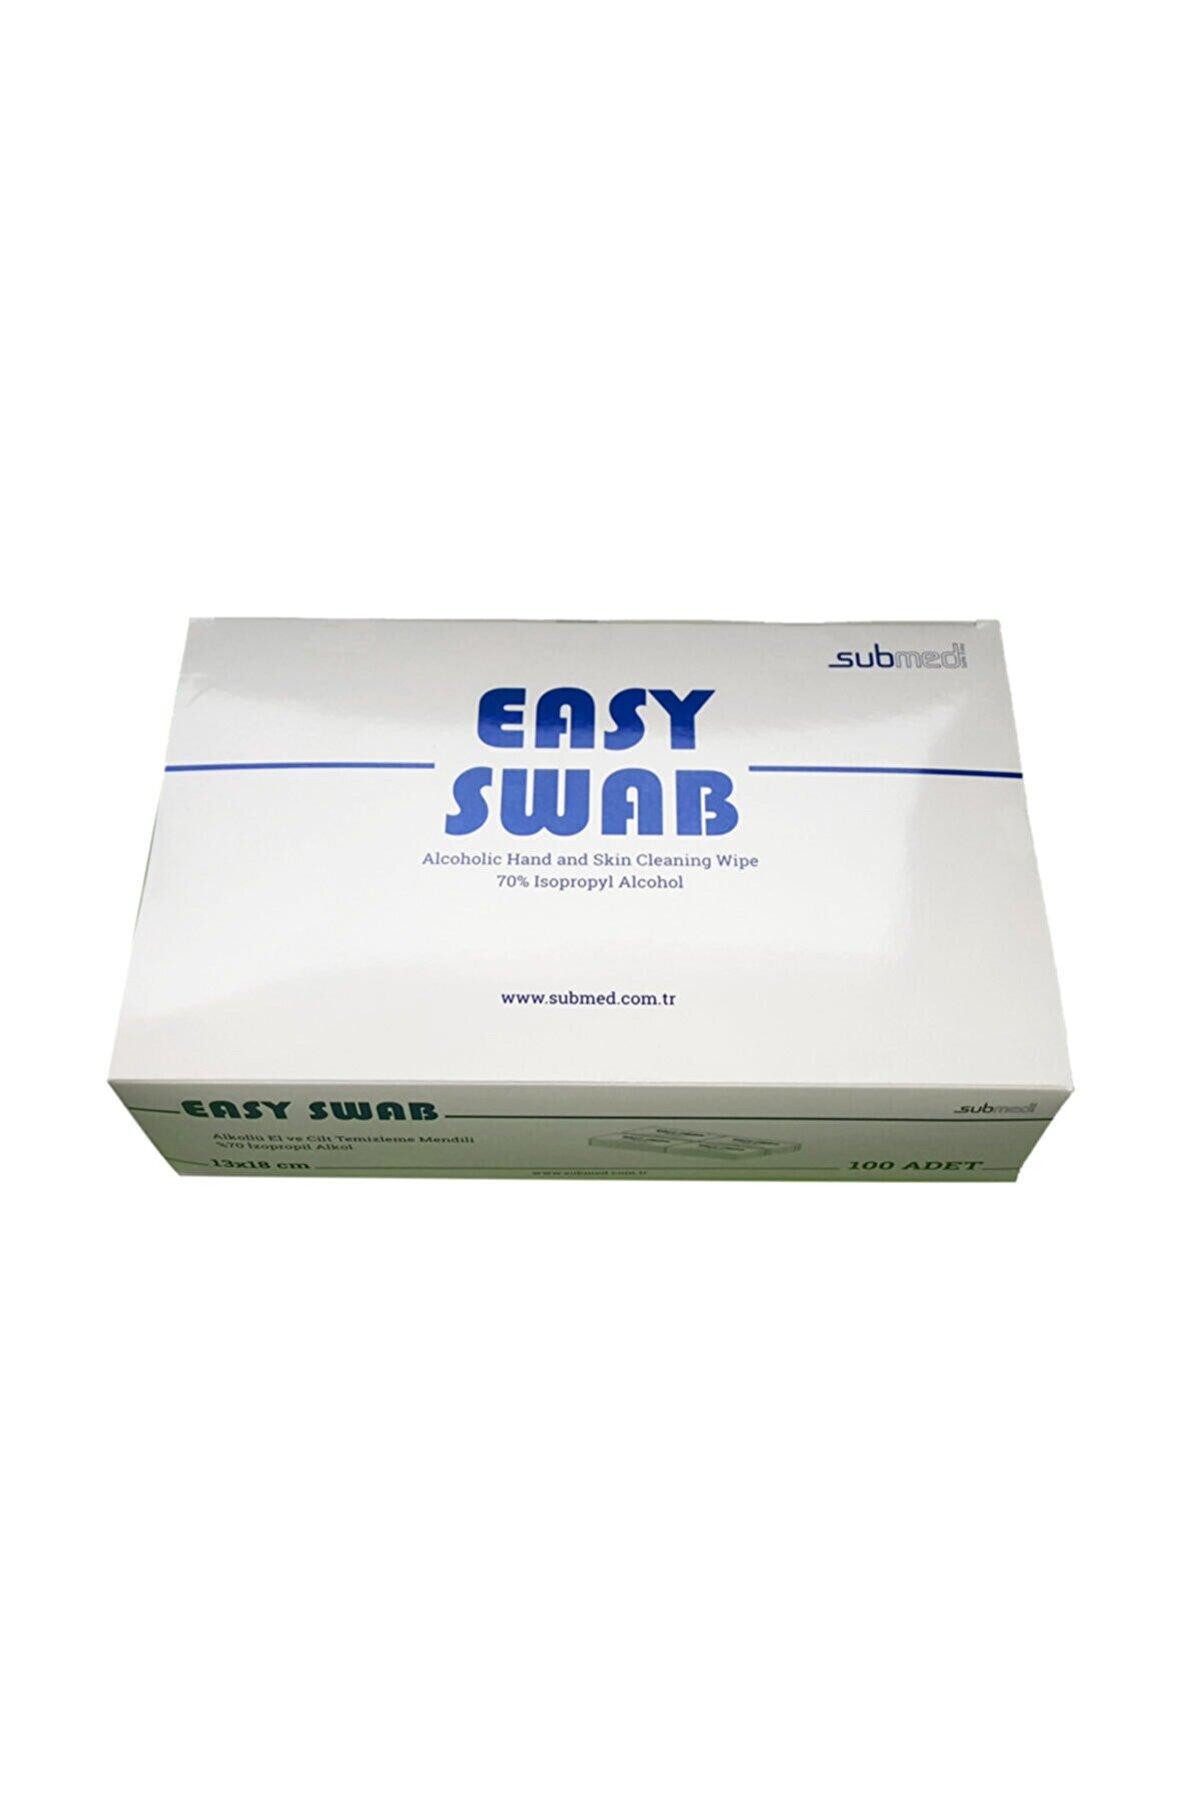 Easy 100 Adet, Alkollü Mendil 13x18 , Daha Buyuk El Temizleme Mendili,